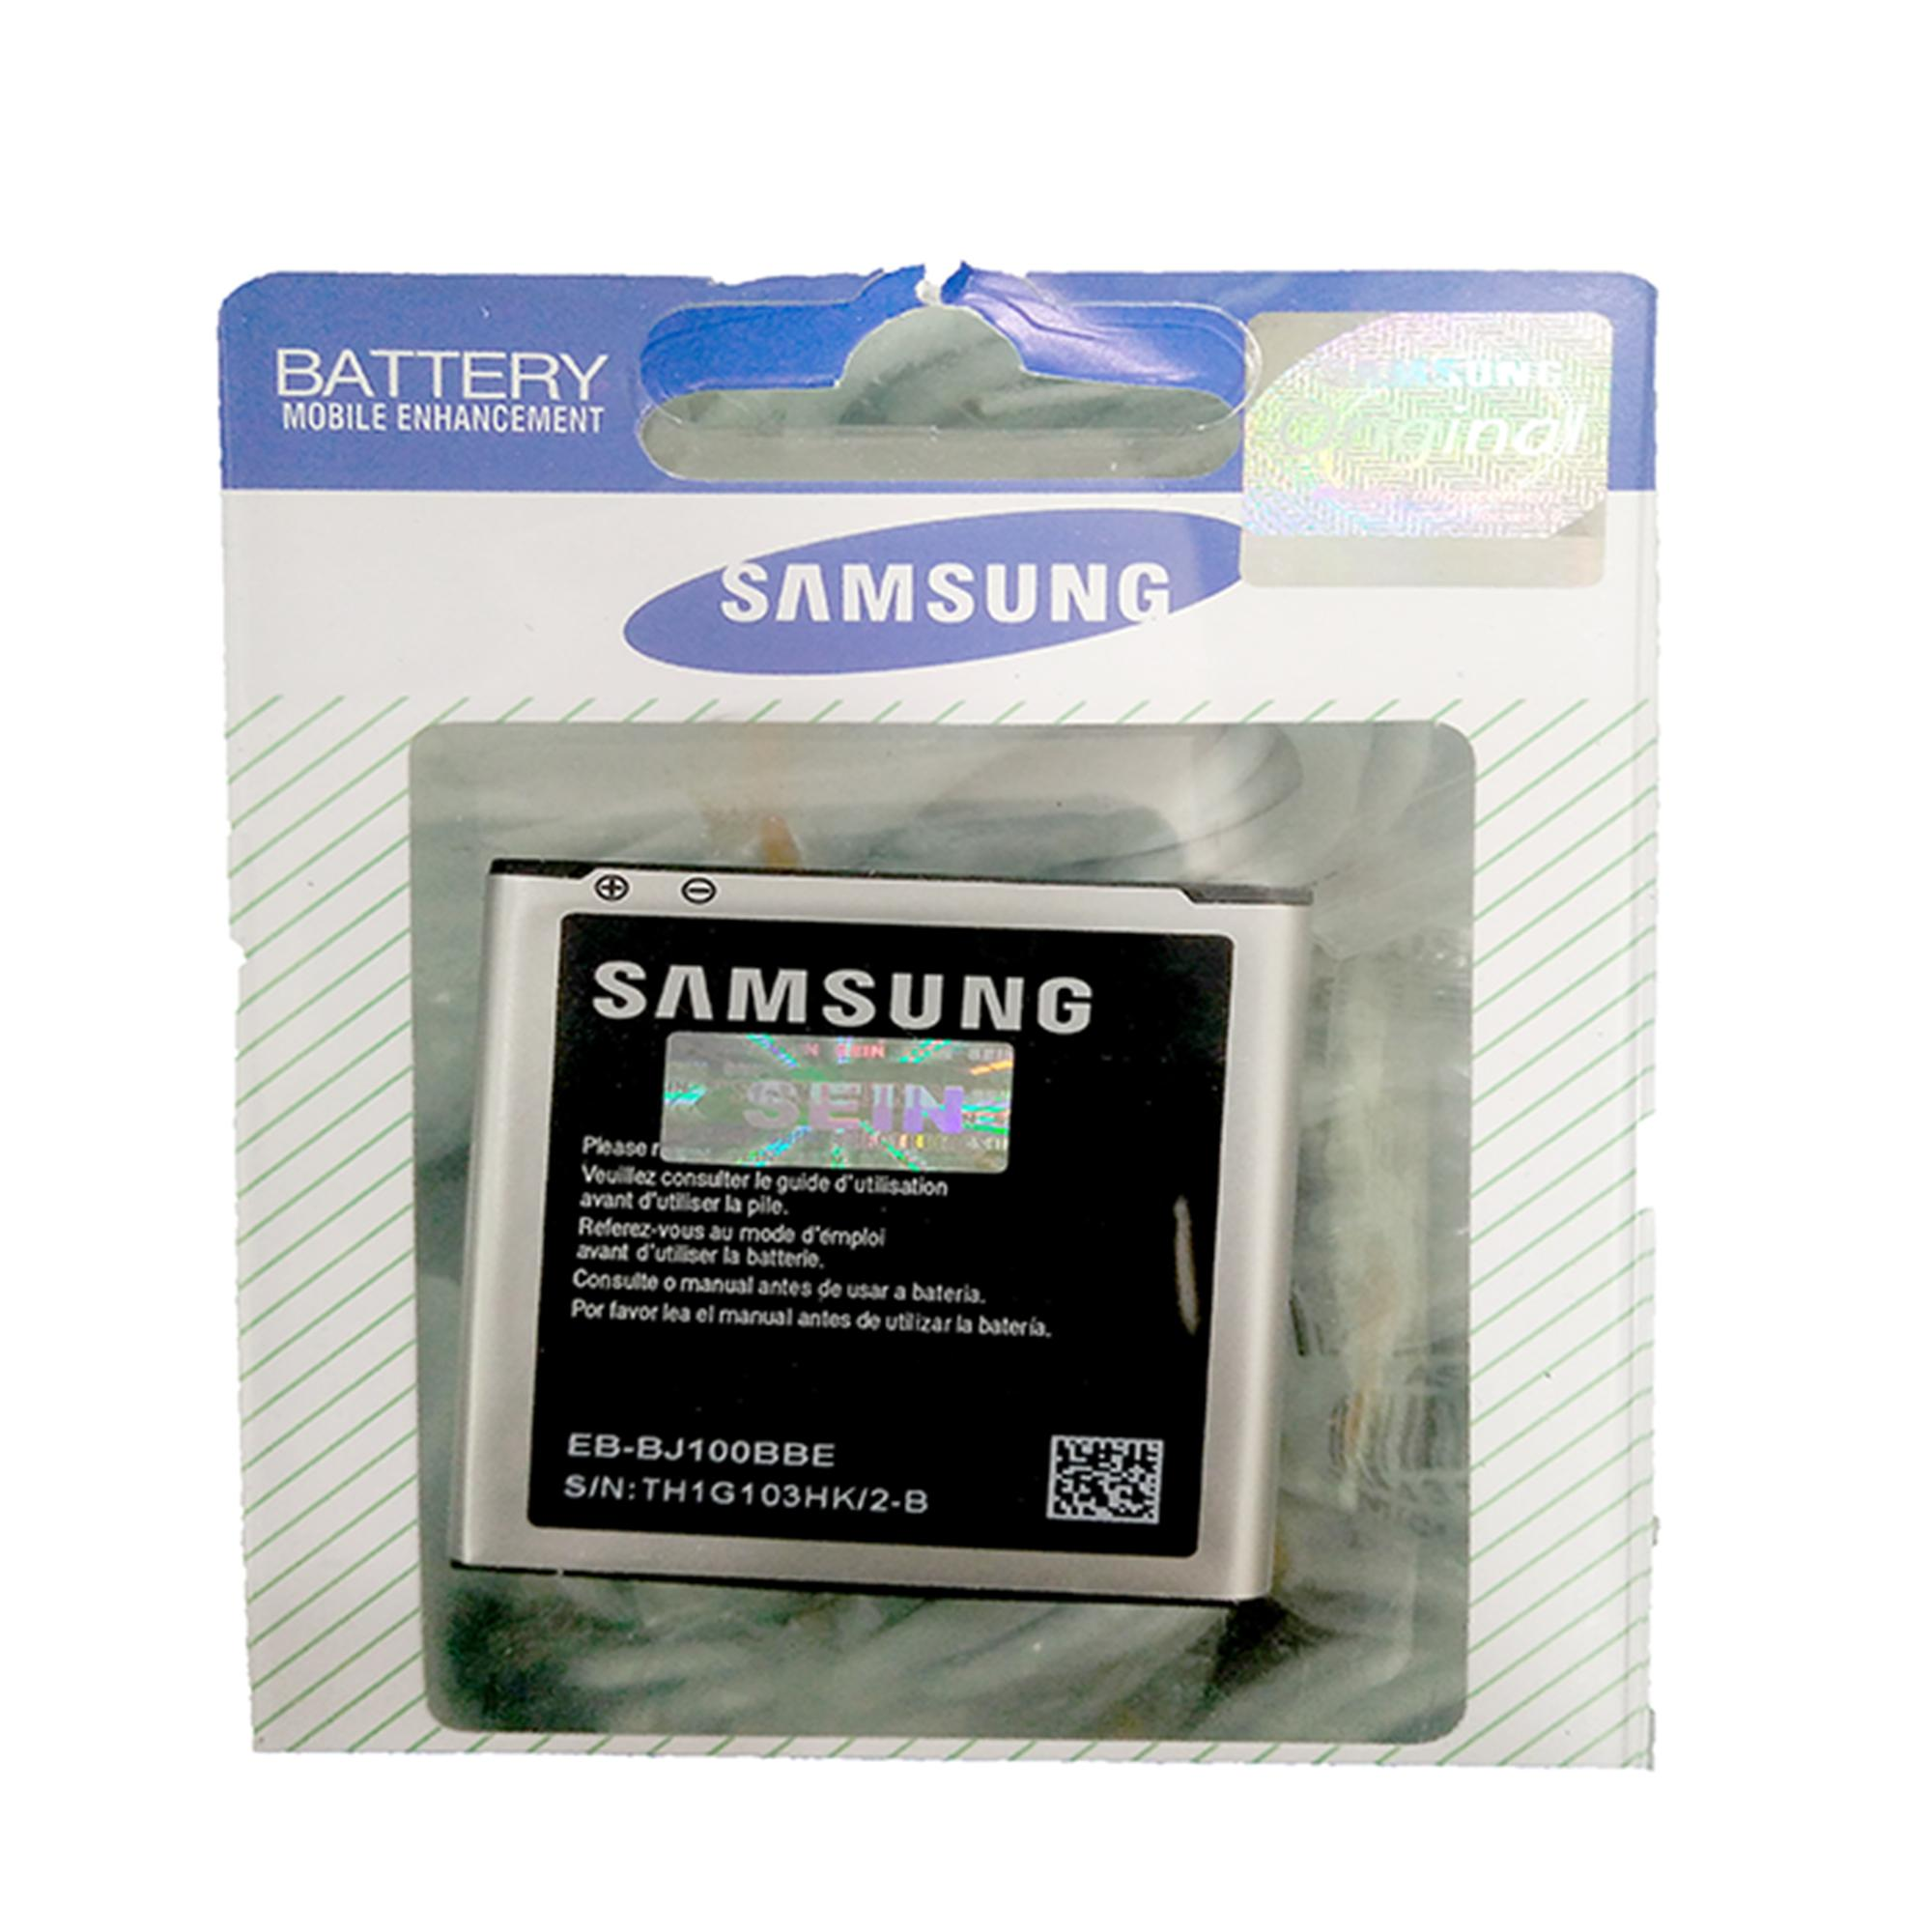 Baterai Batre Batrie Samsung Grand Dous / Gt 19082 ORIGINAL DAN Termurah